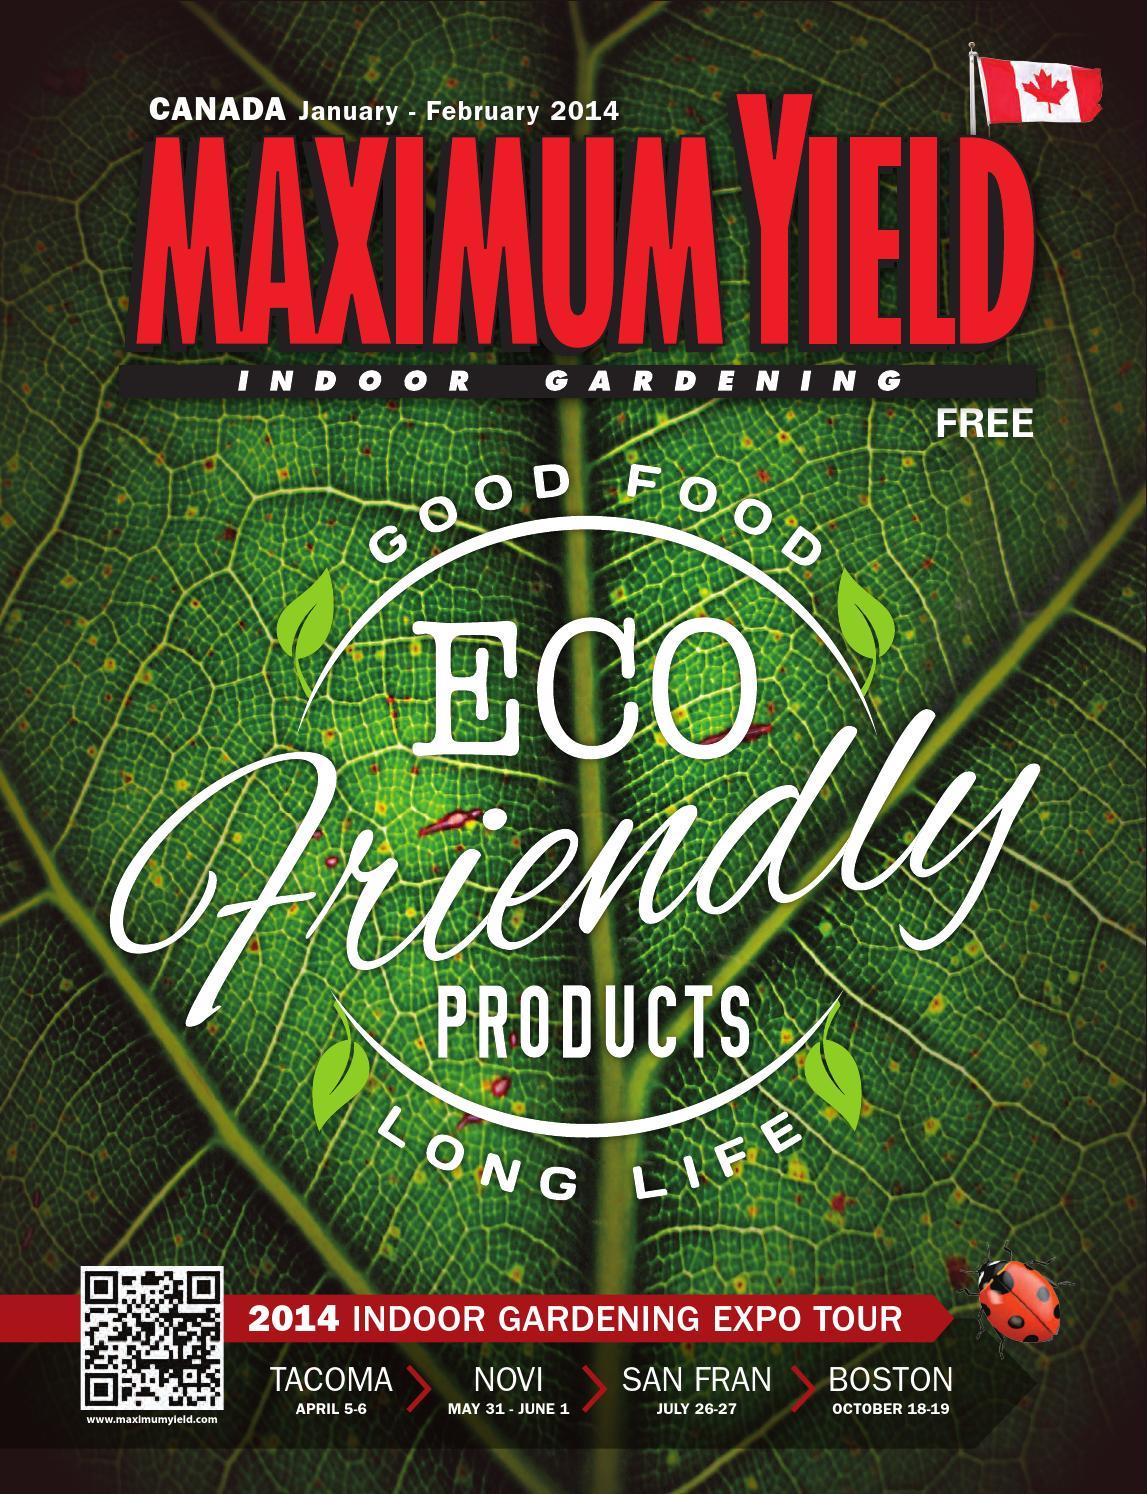 Maximum yield canada january february 2014 by maximum for Indoor gardening expo 2014